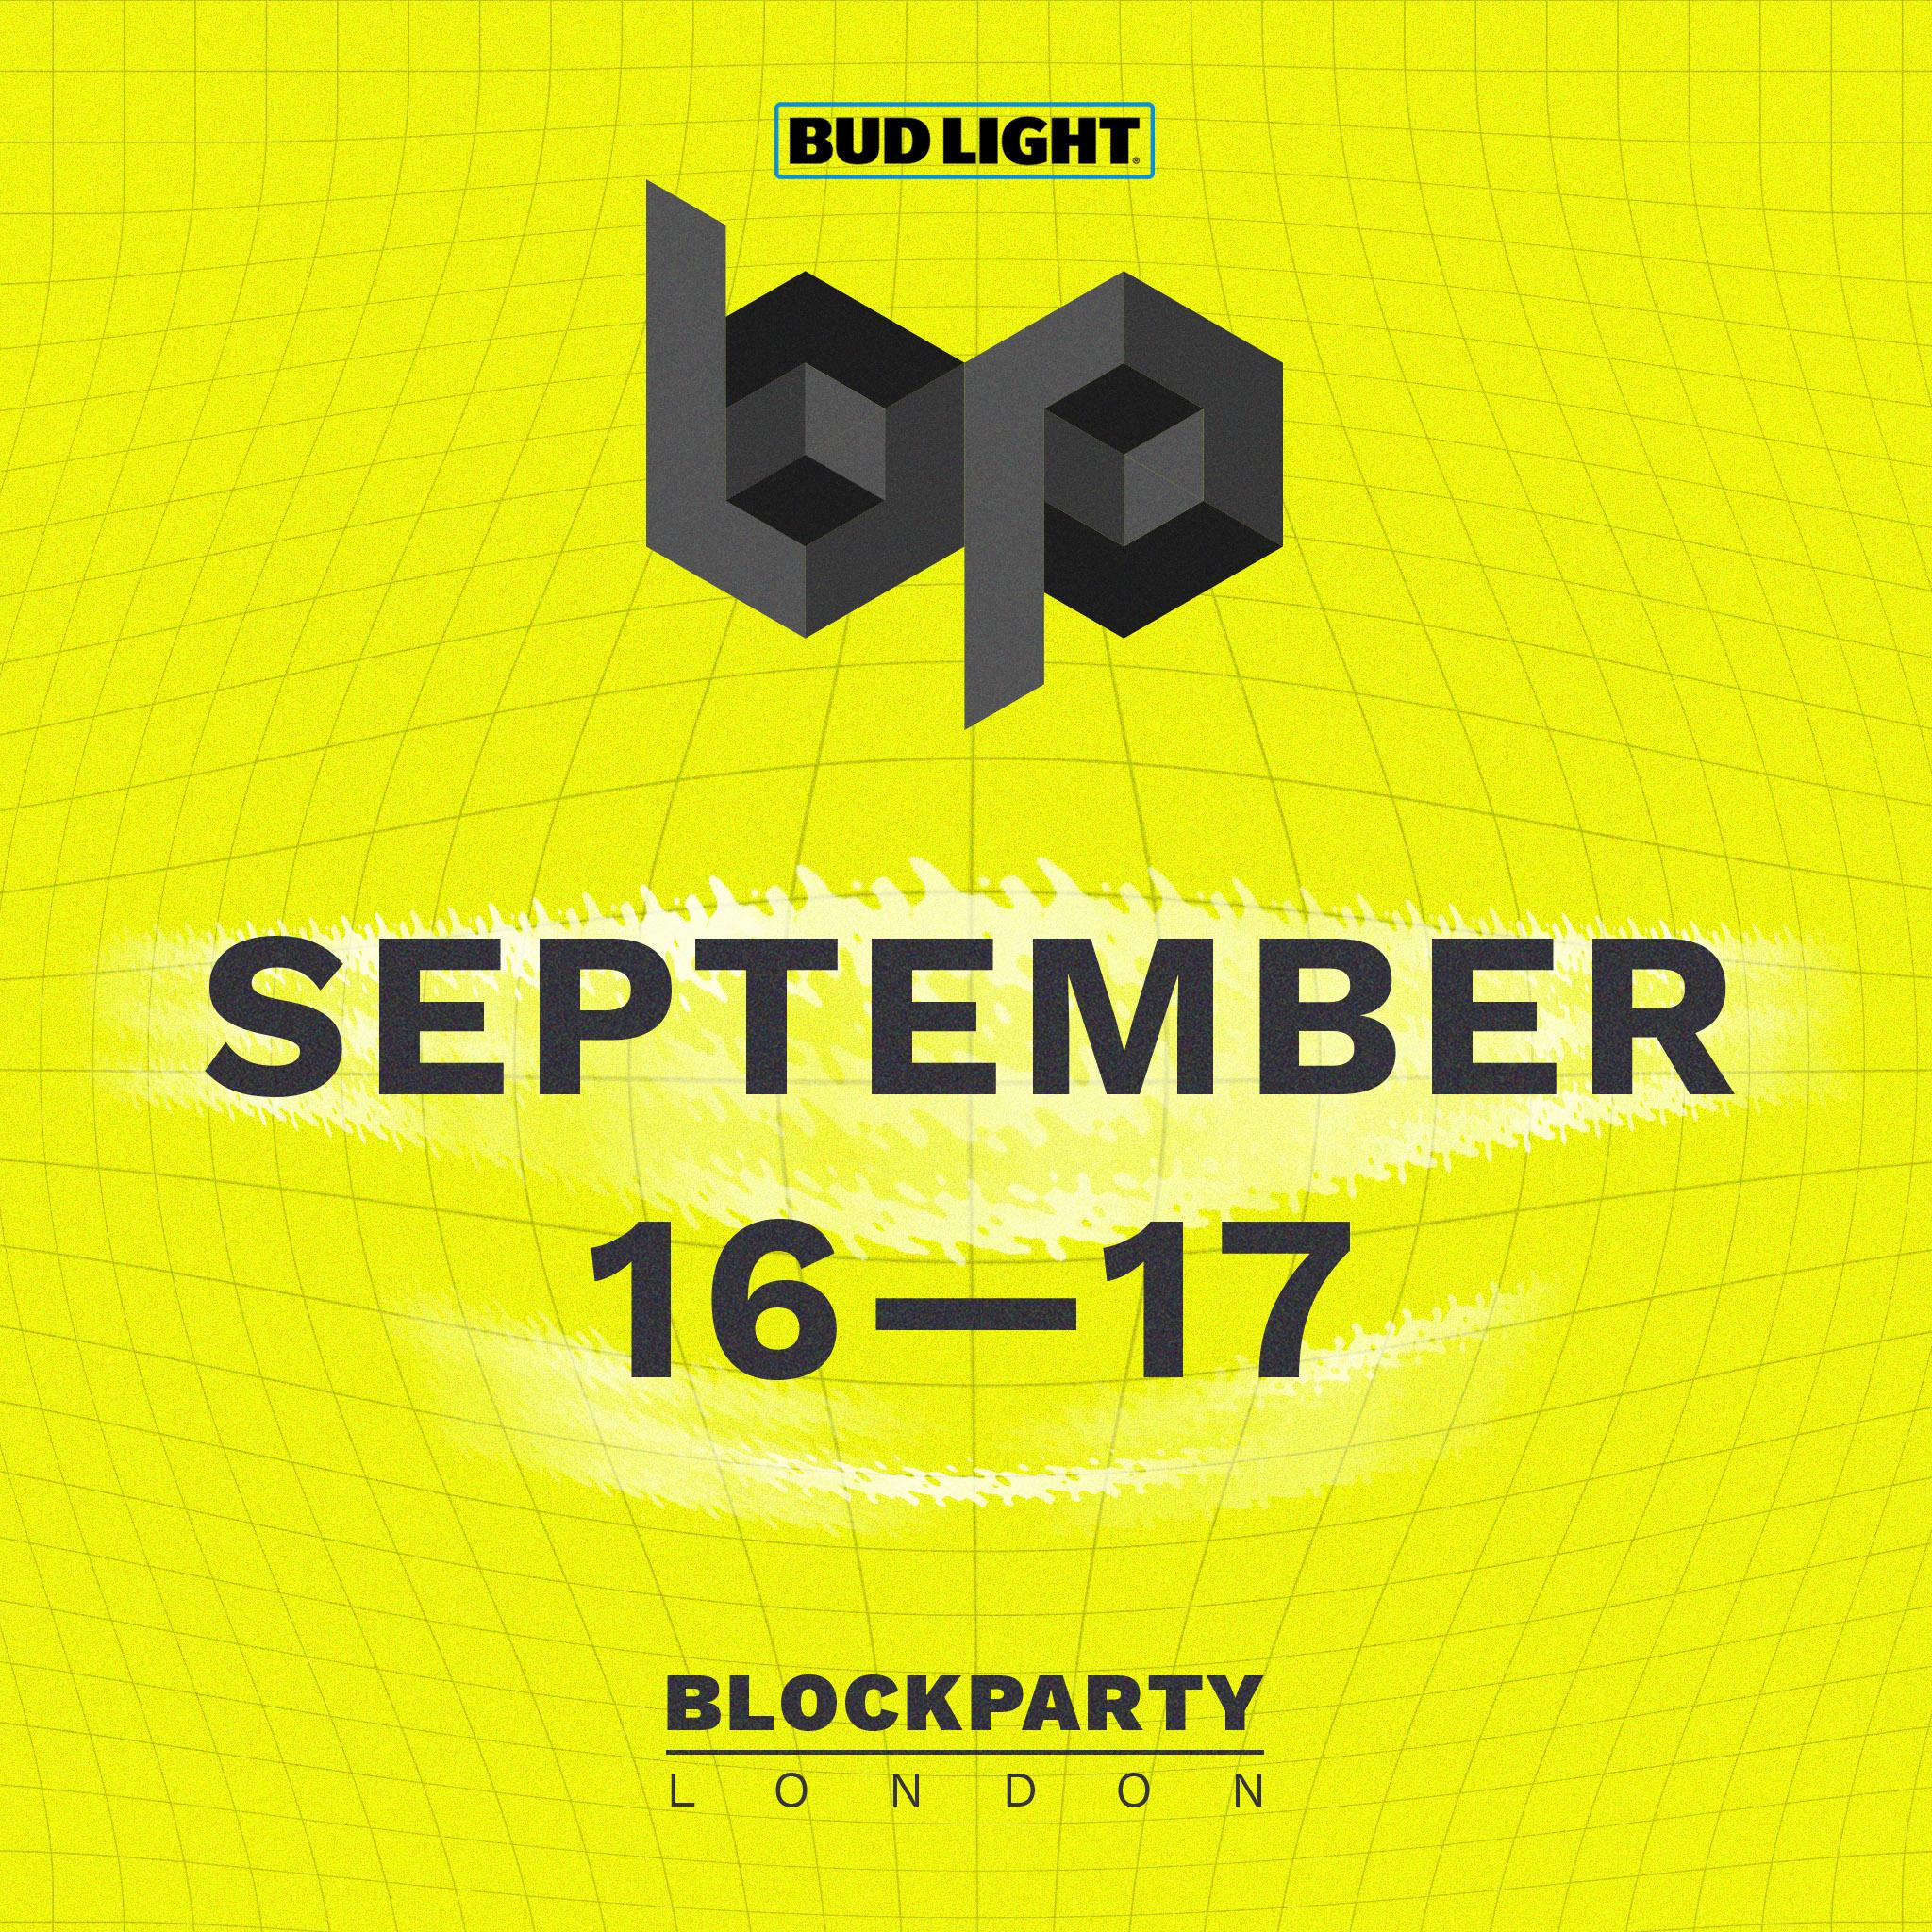 Bud Light Blockparty London   September 14 U2014 15 2018